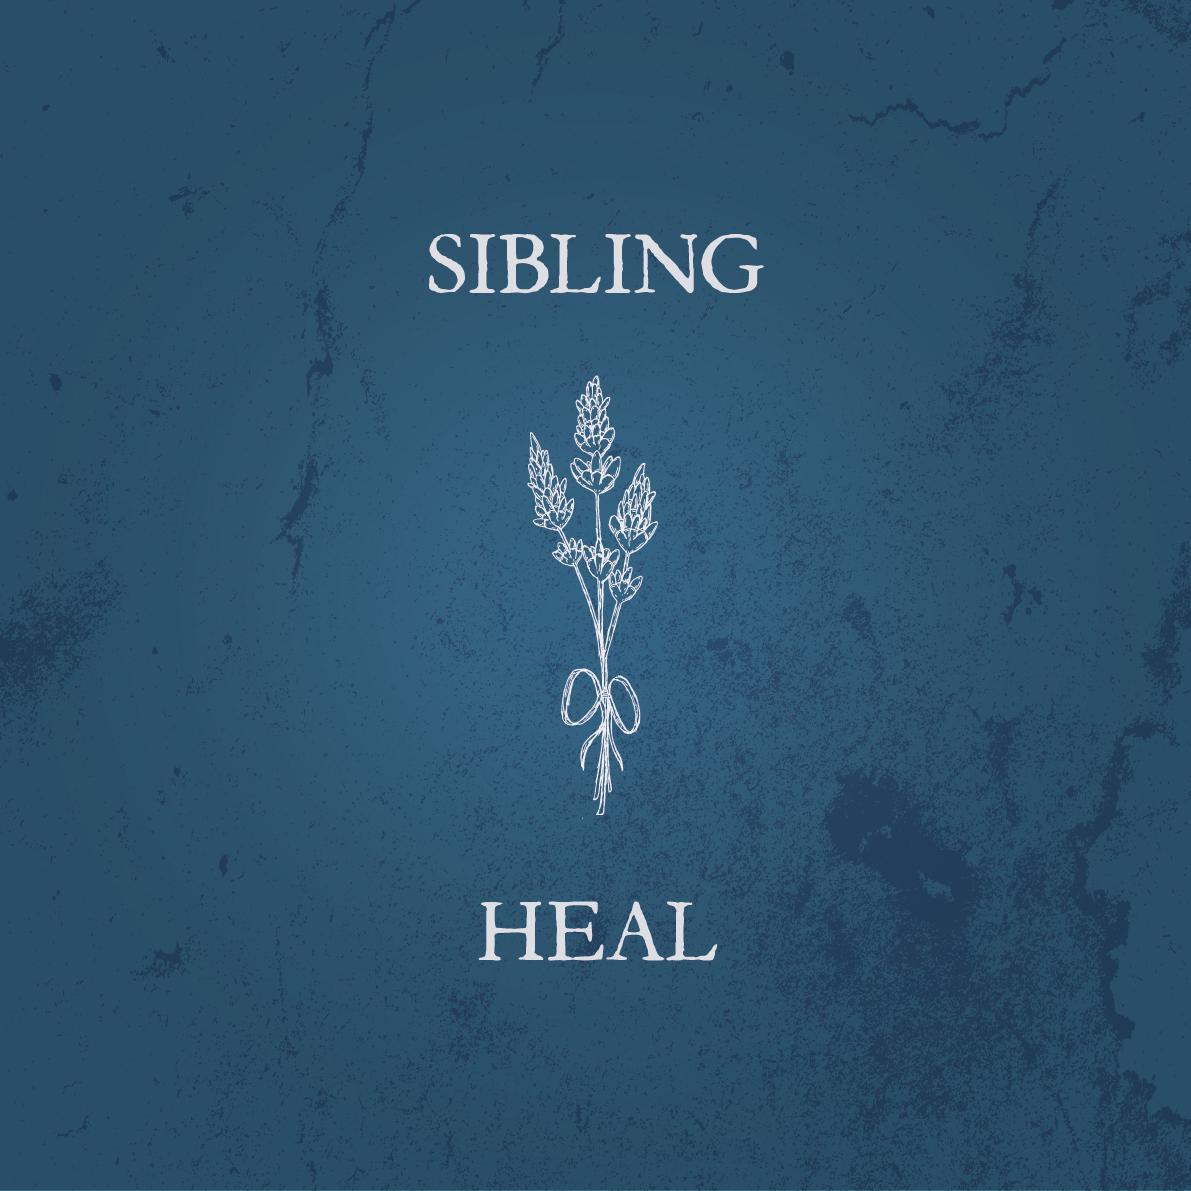 Sibling-cover-mk2-05.png